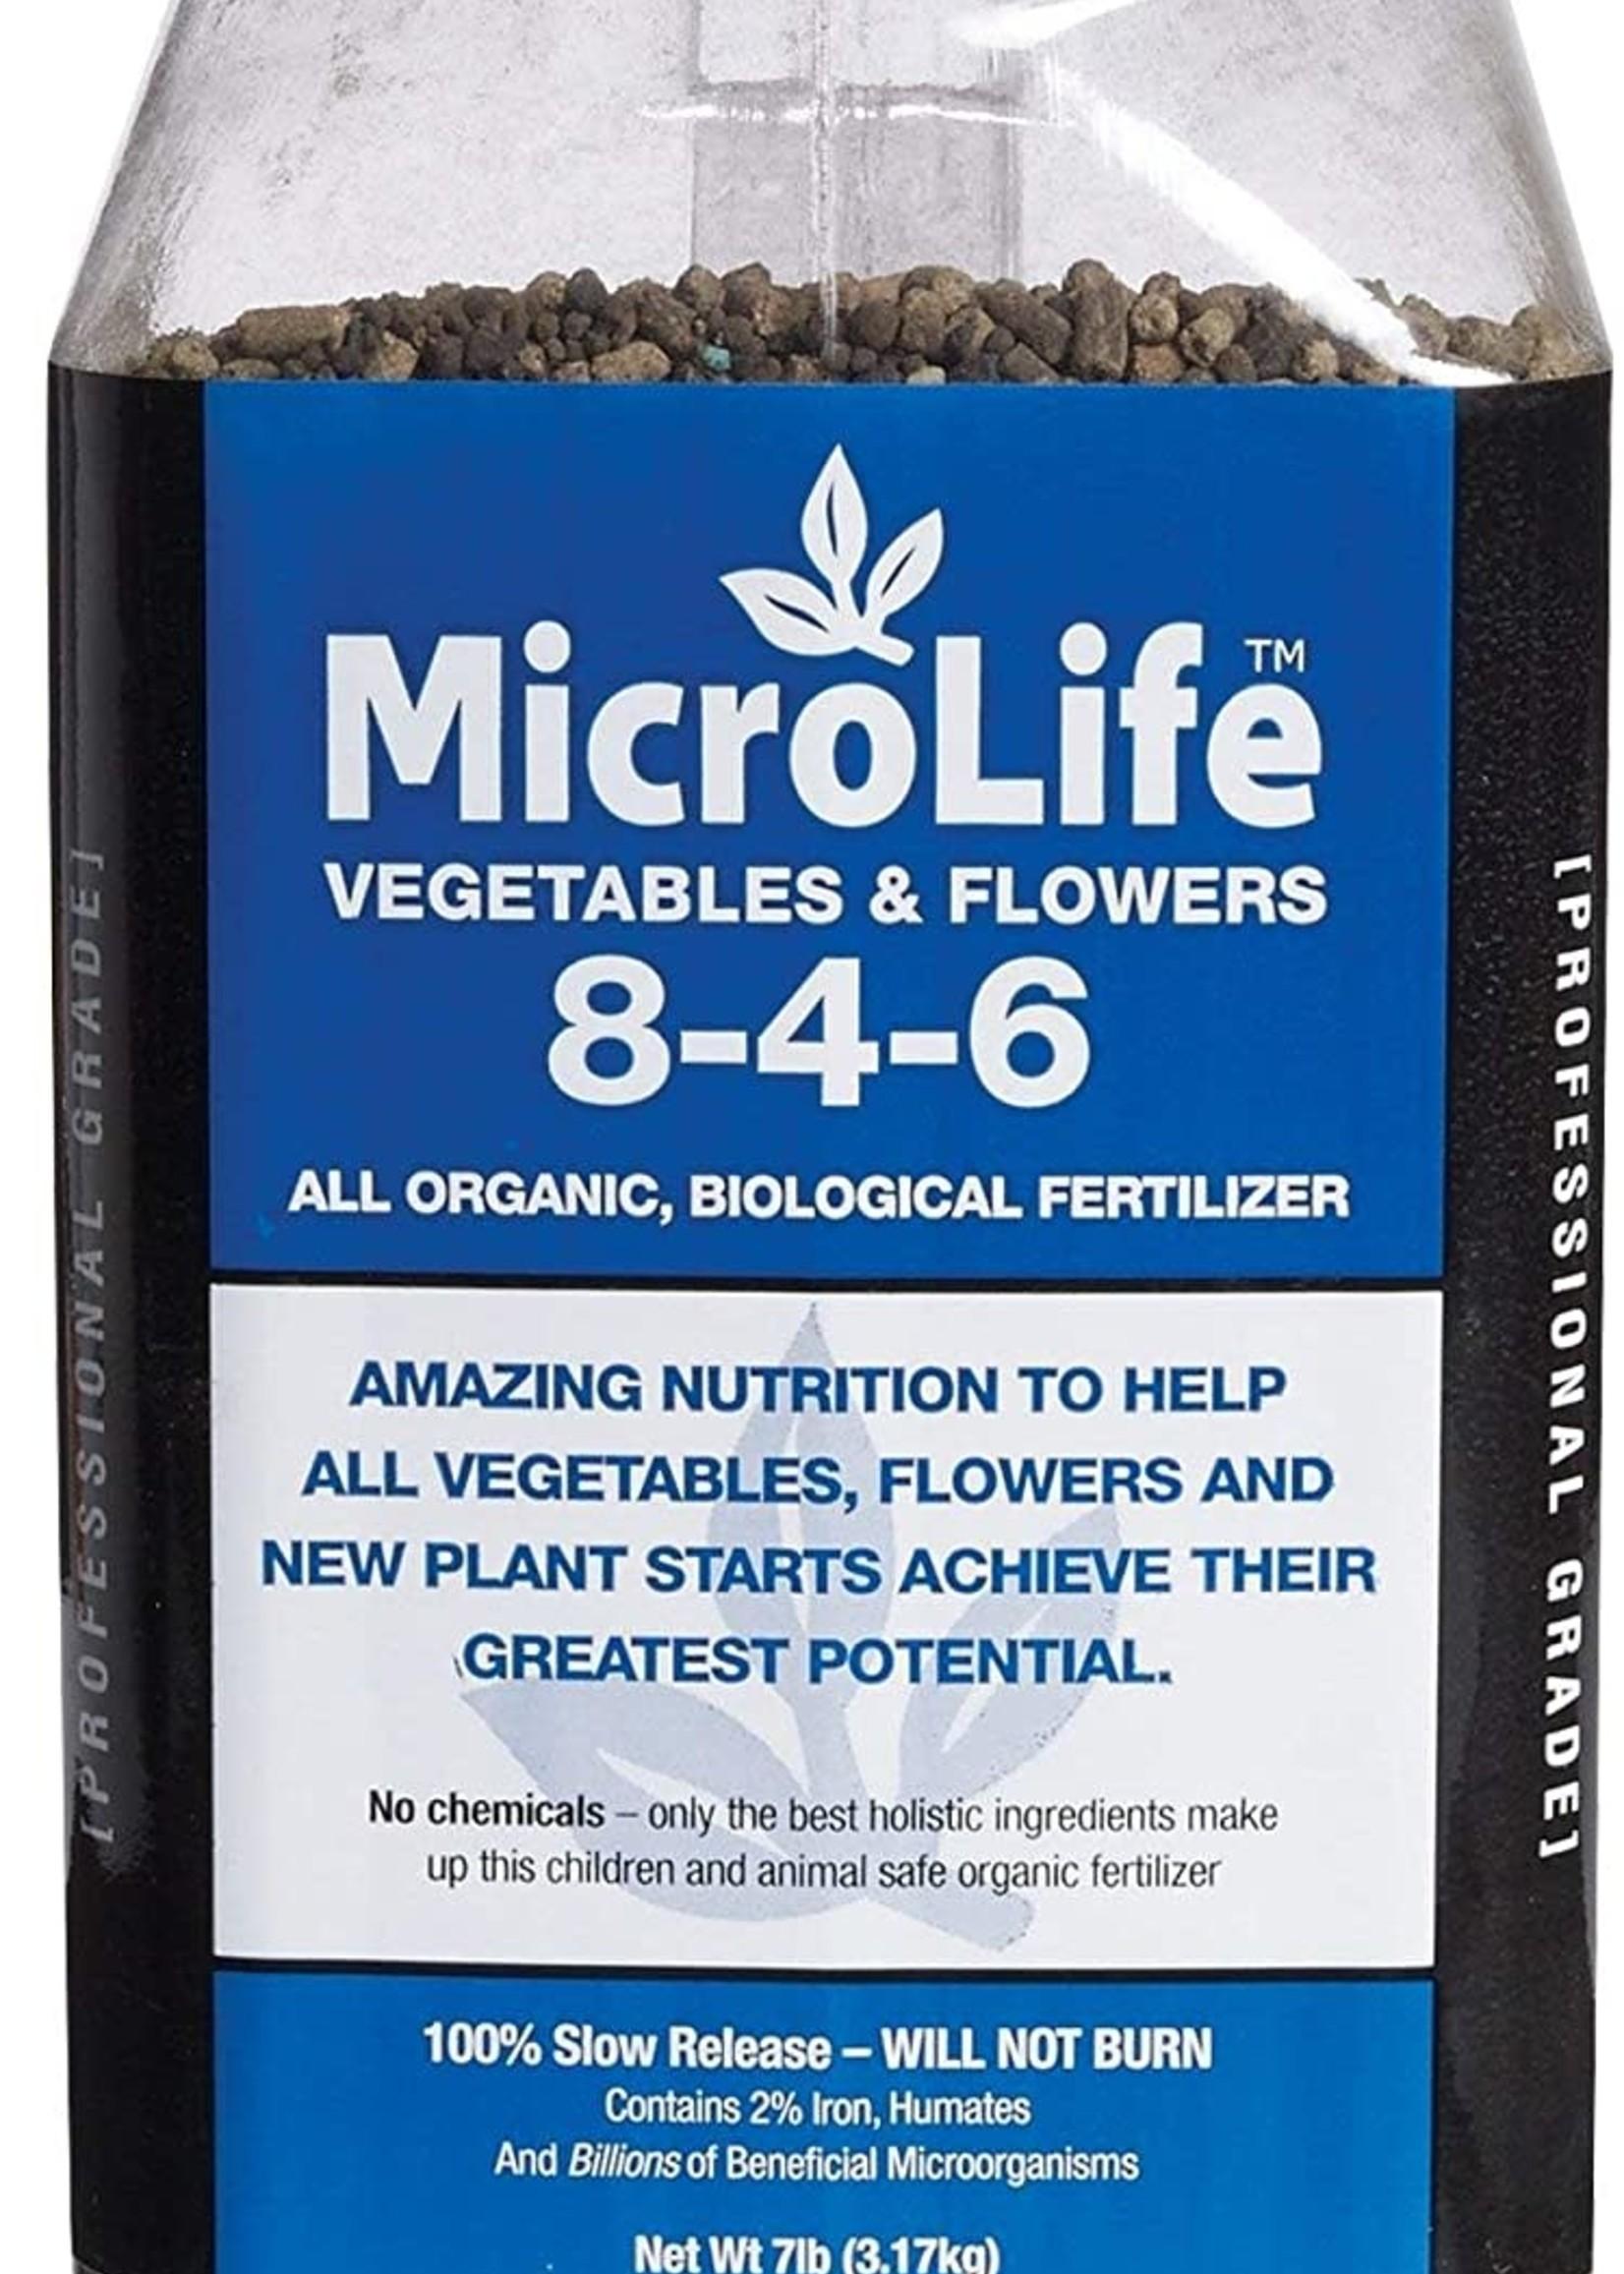 MicroLife Ultimate 8-4-6 7 lb. jug